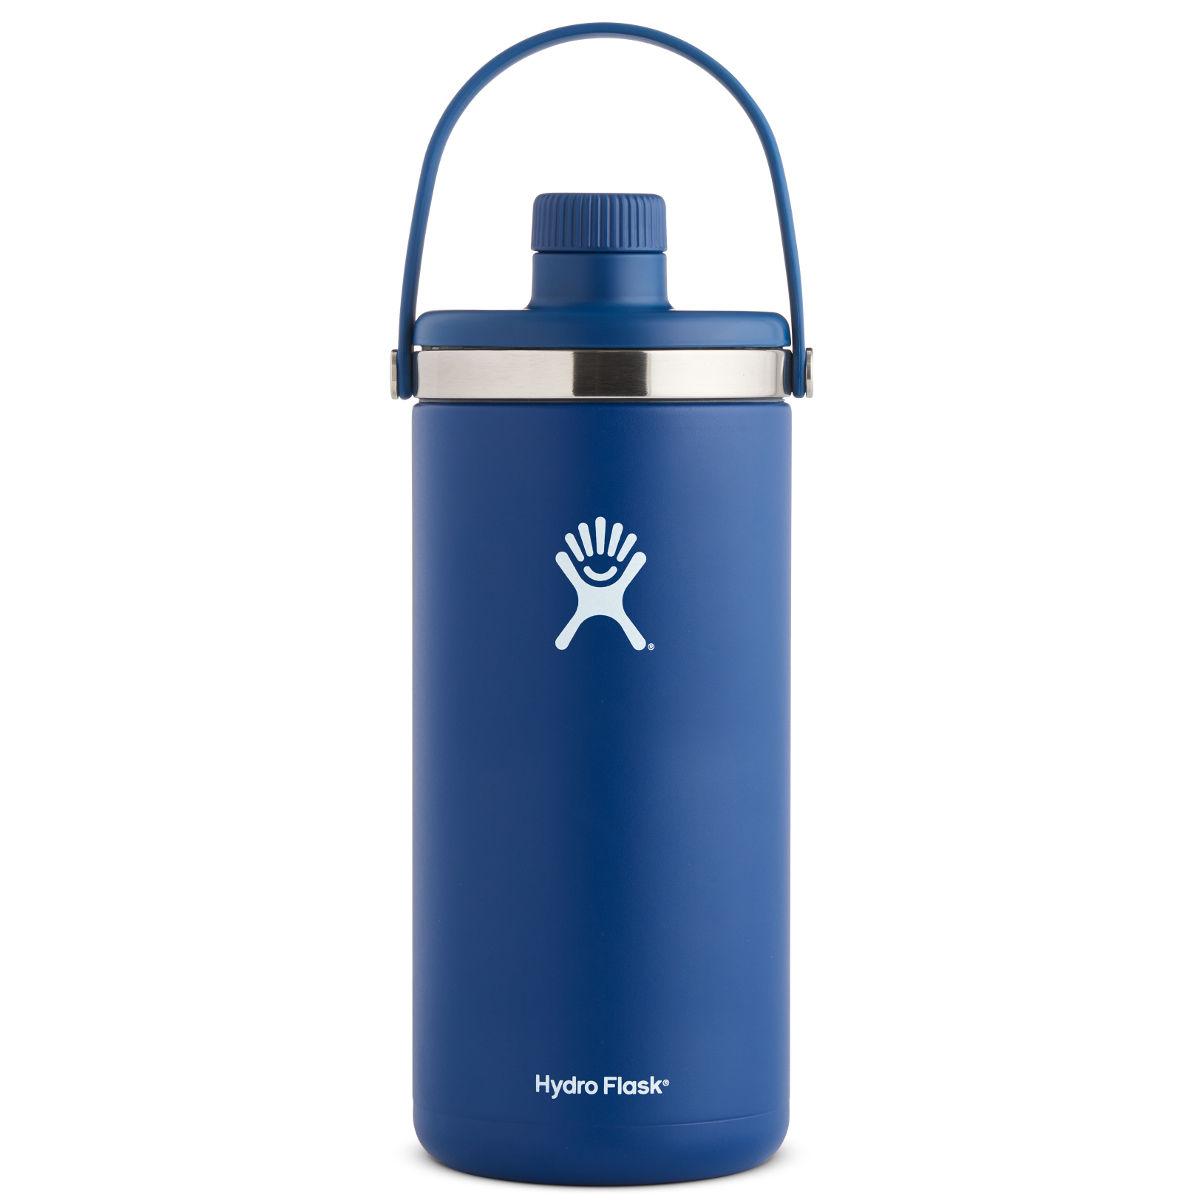 Hydro Flask 128 Oz. Oasis Jug